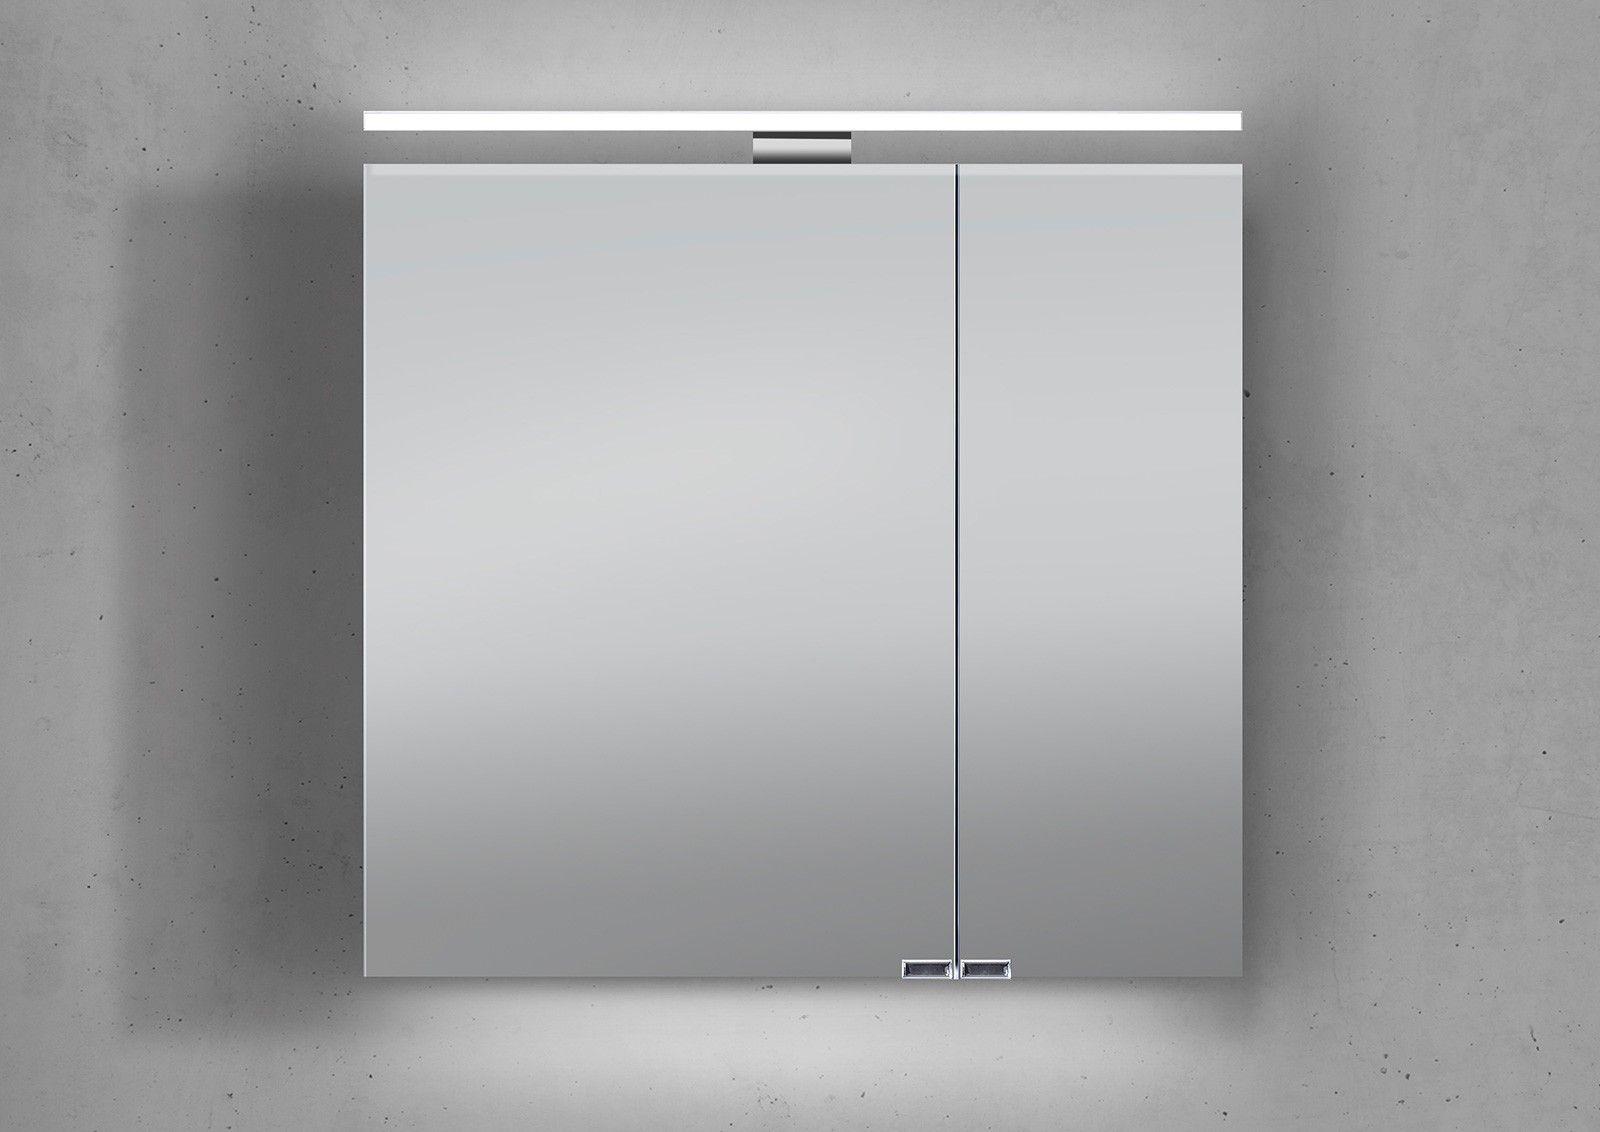 spiegelschrank 70 cm led beleuchtung doppelseitig verspiegelt ... - Badezimmer Spiegelschrank Mit Beleuchtung Günstig